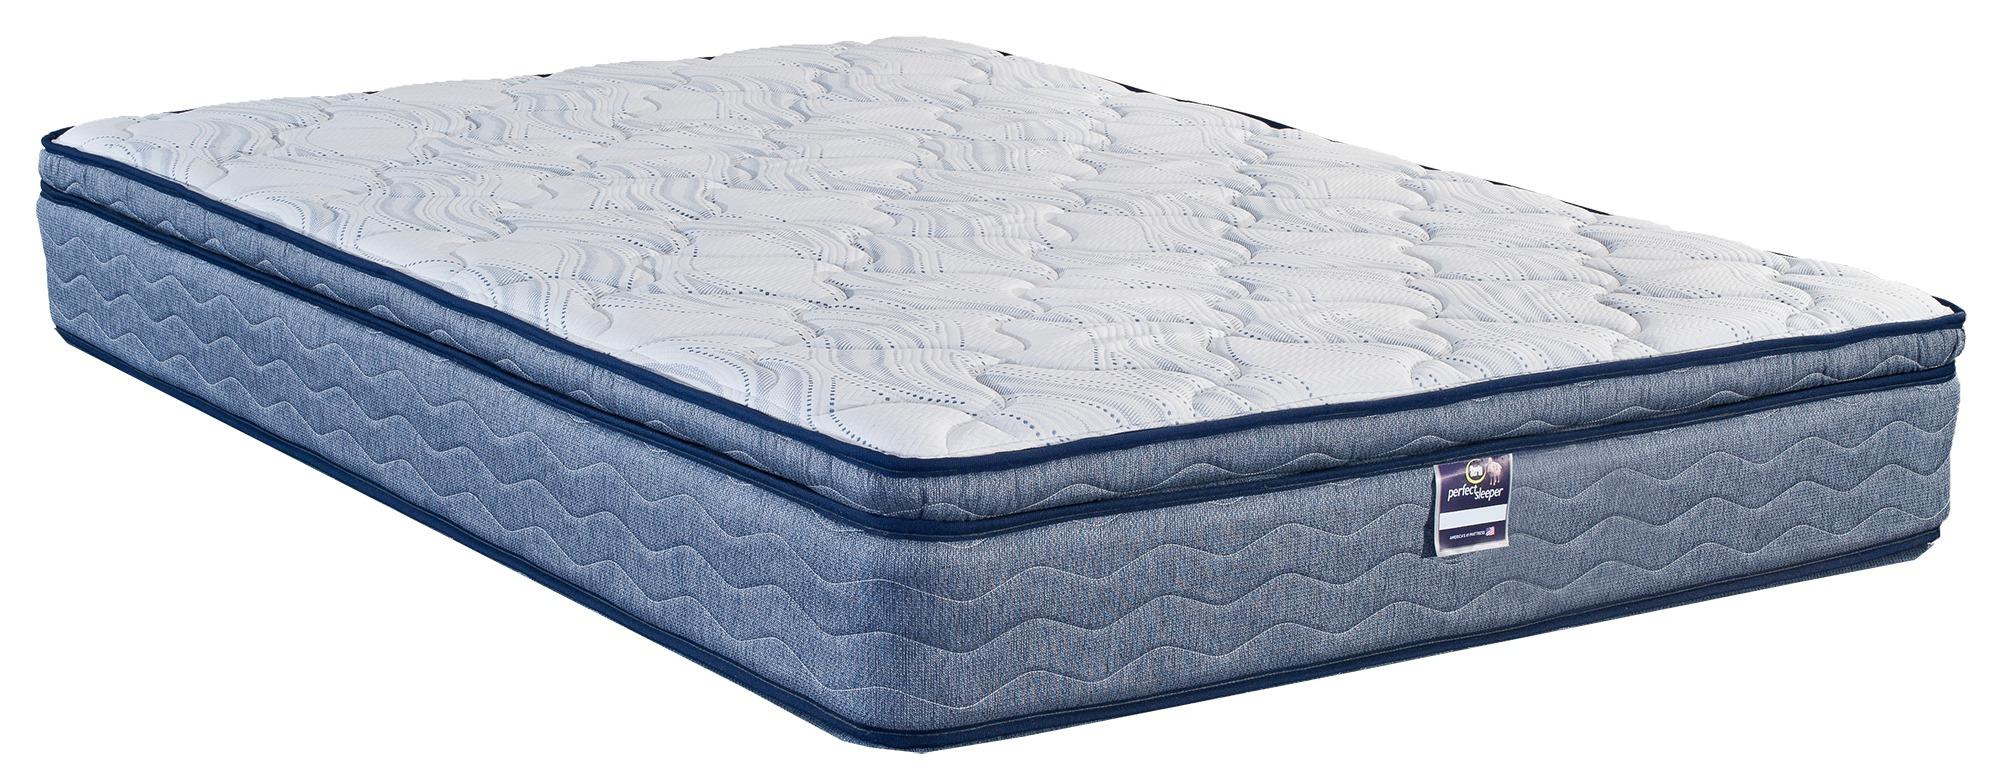 serta 4 6 spinal care elite pillow top mattress 2243